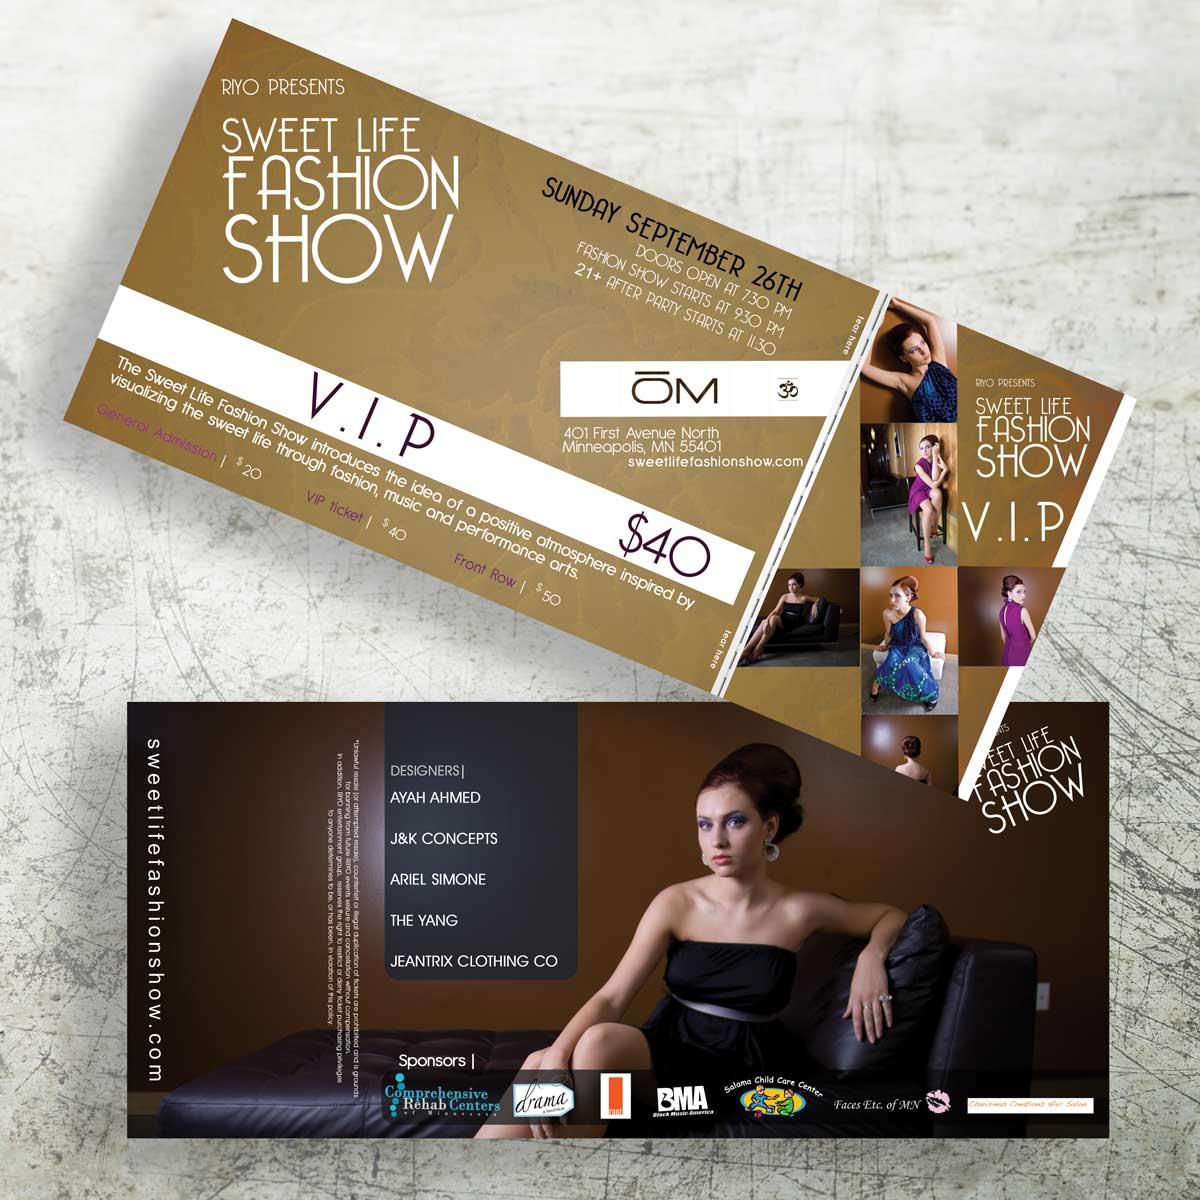 Sweet Life Fashion Show VIP Ticket Design